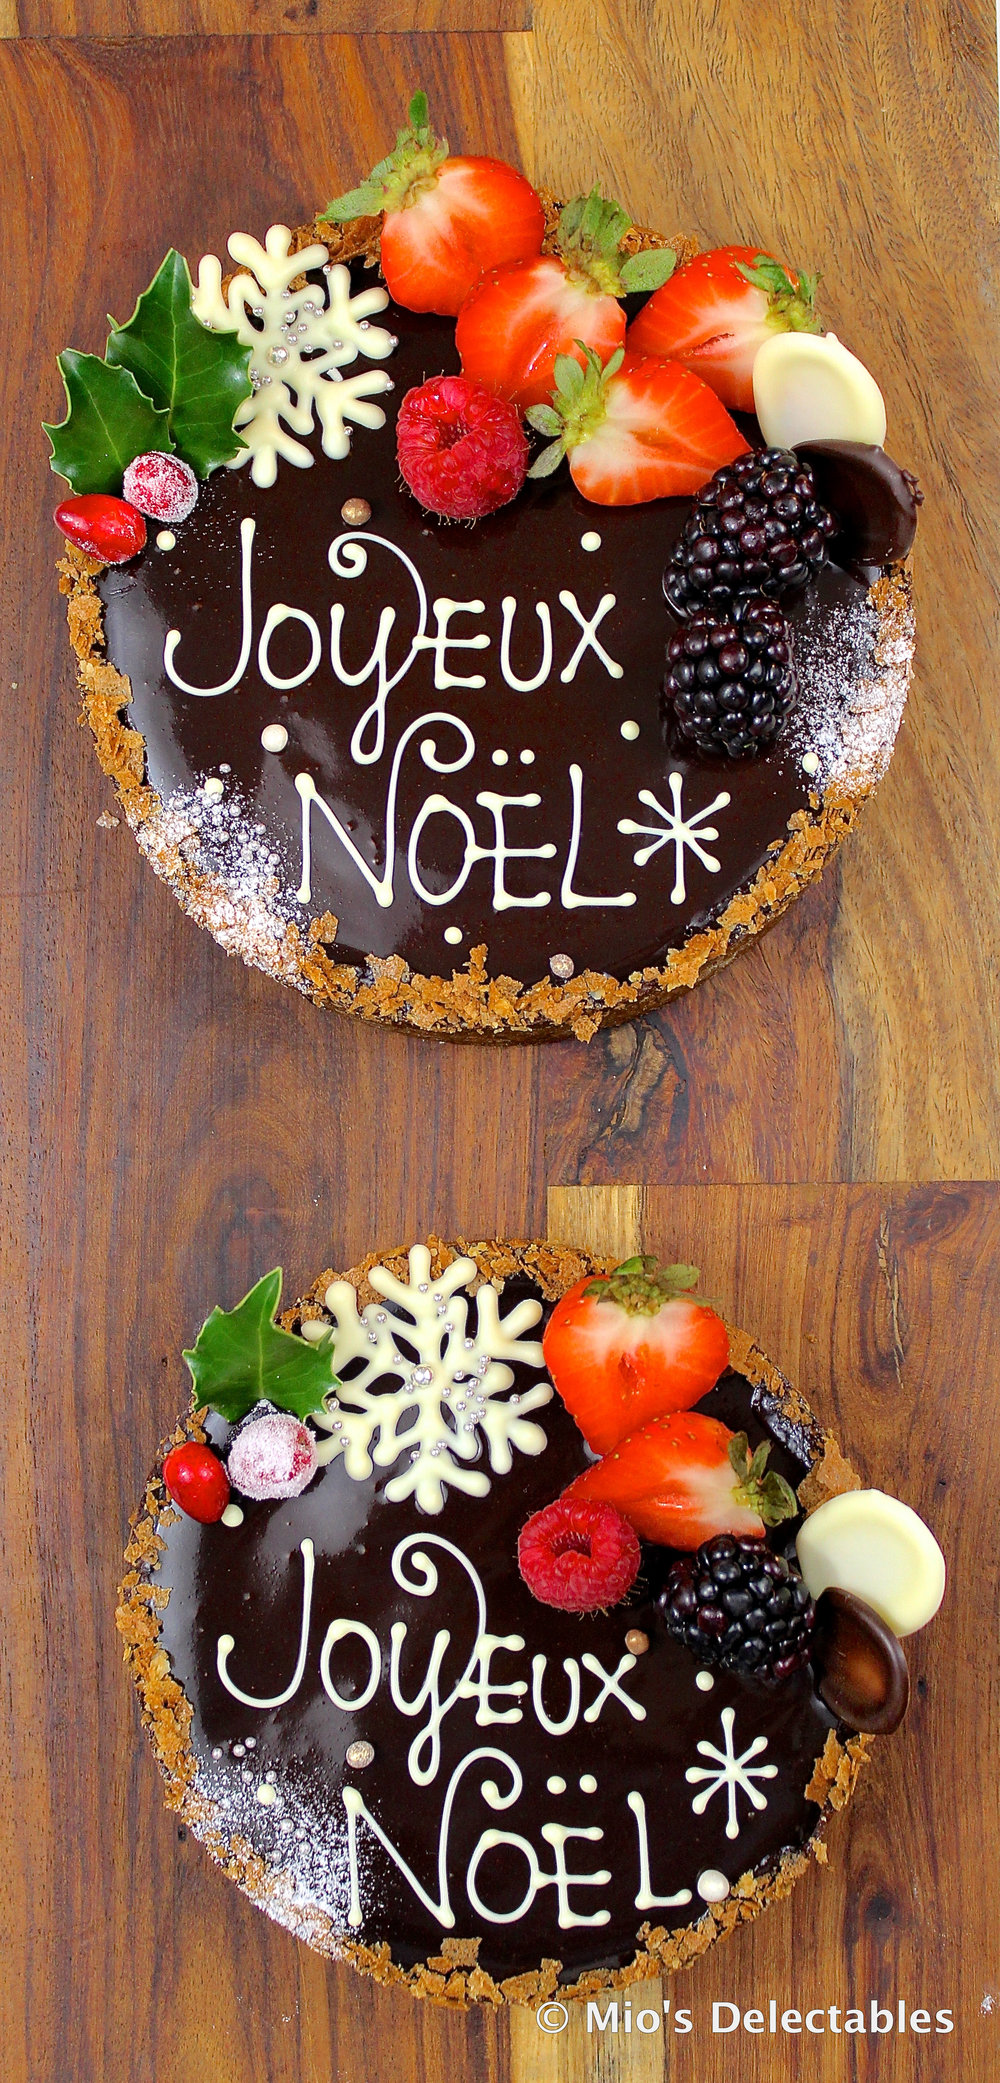 "*Tarte Fine au Chocolat w/ Shiba Wichern Cellars Red Wine & Cranberry Confiture 5.5"" $28 6.5"" $35  https://www.miosdelectables.com/christmas-cake-preorder/ktofzon8omct6vbpvey80x5blp4fgq"